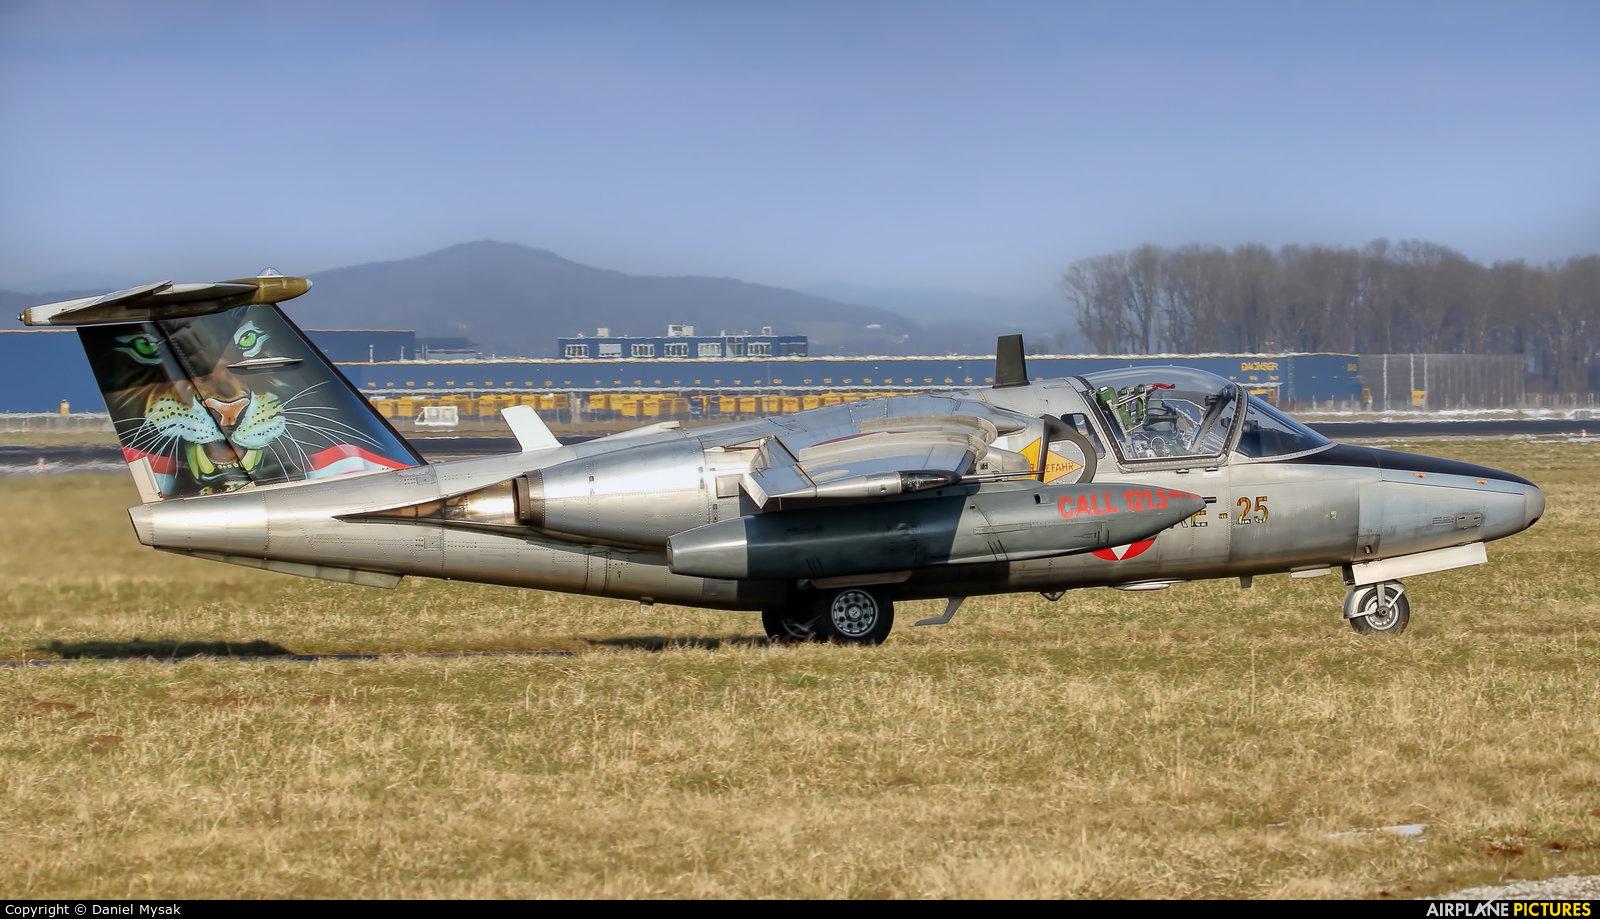 Austria - Air Force 1125 aircraft at Linz